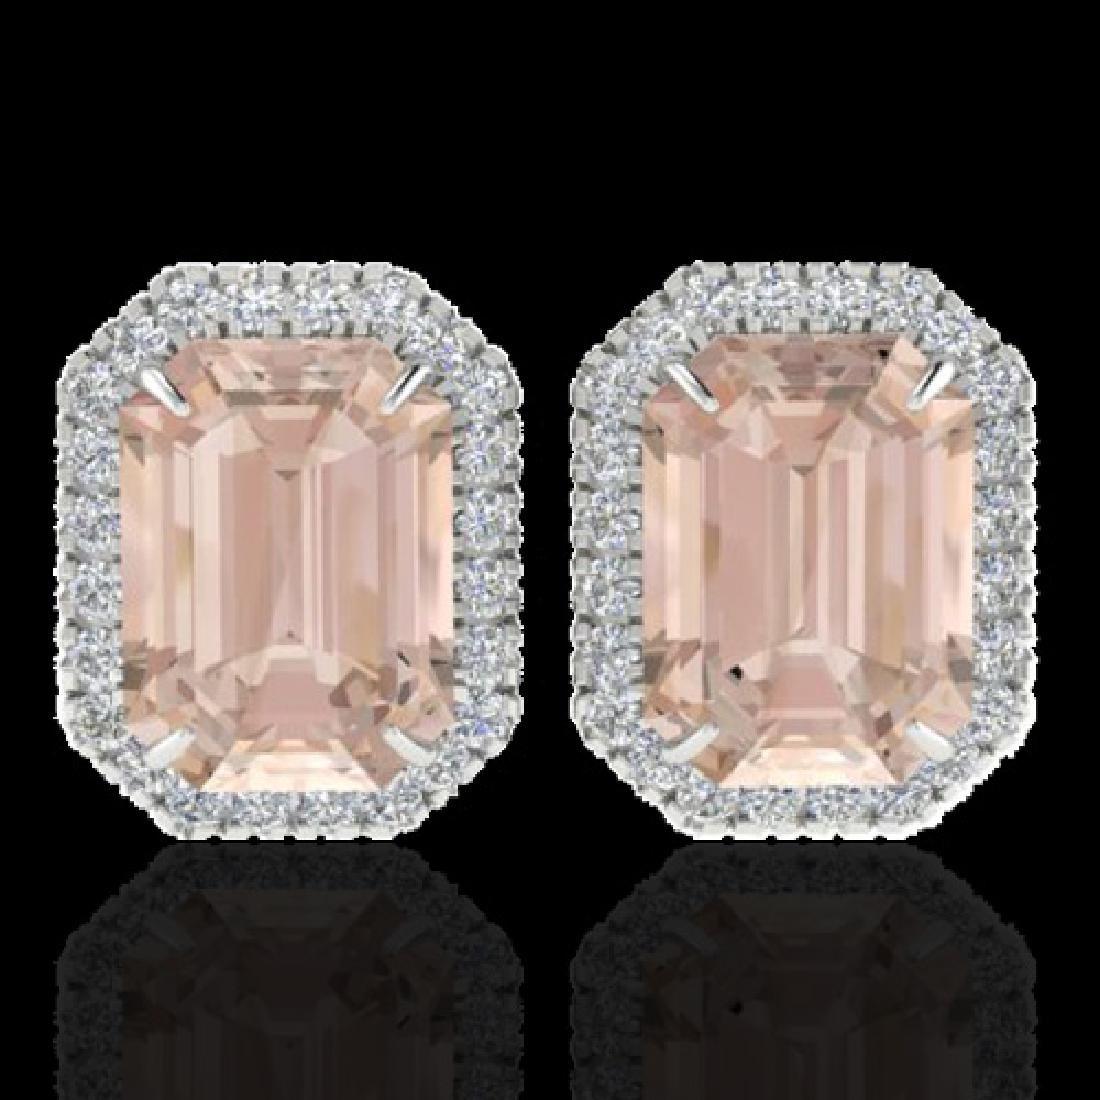 8.40 CTW Morganite & Micro Pave VS/SI Diamond Halo